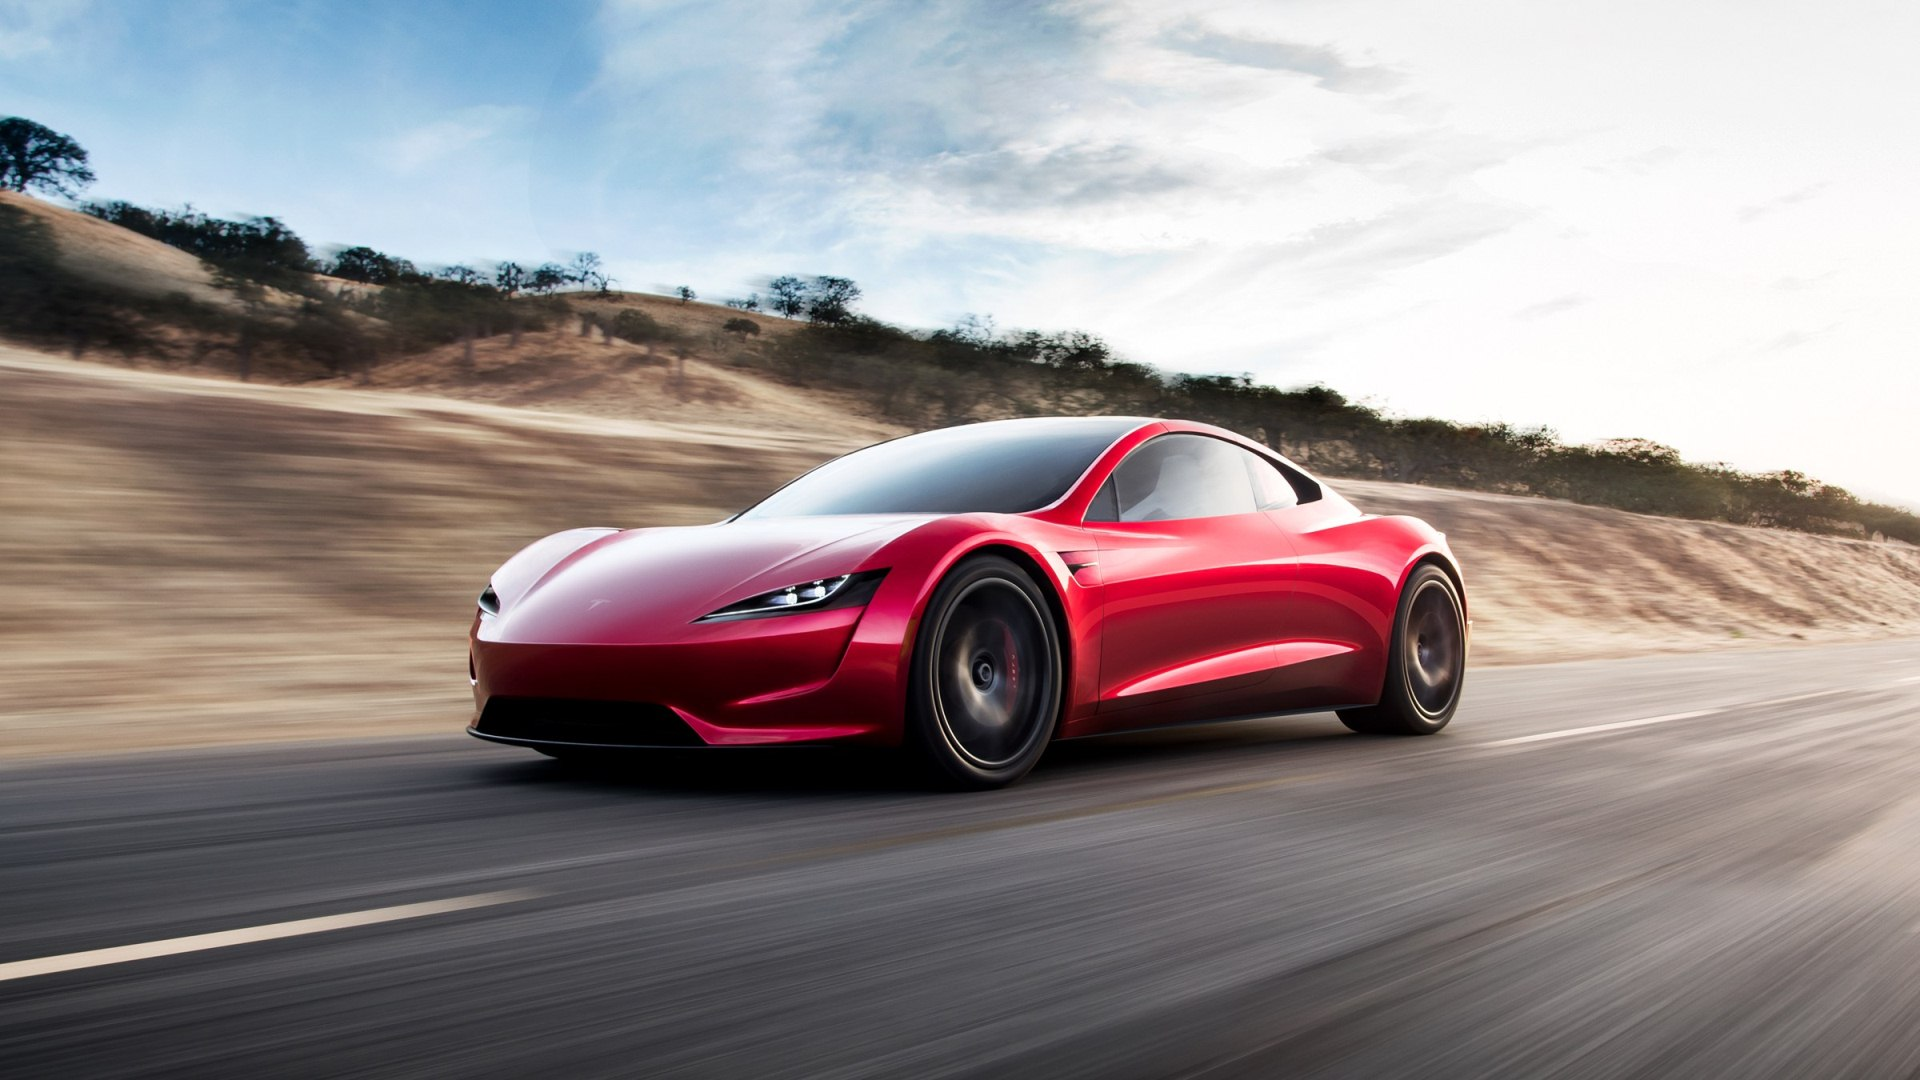 Tesla Roadster Wallpapers Top Free Tesla Roadster